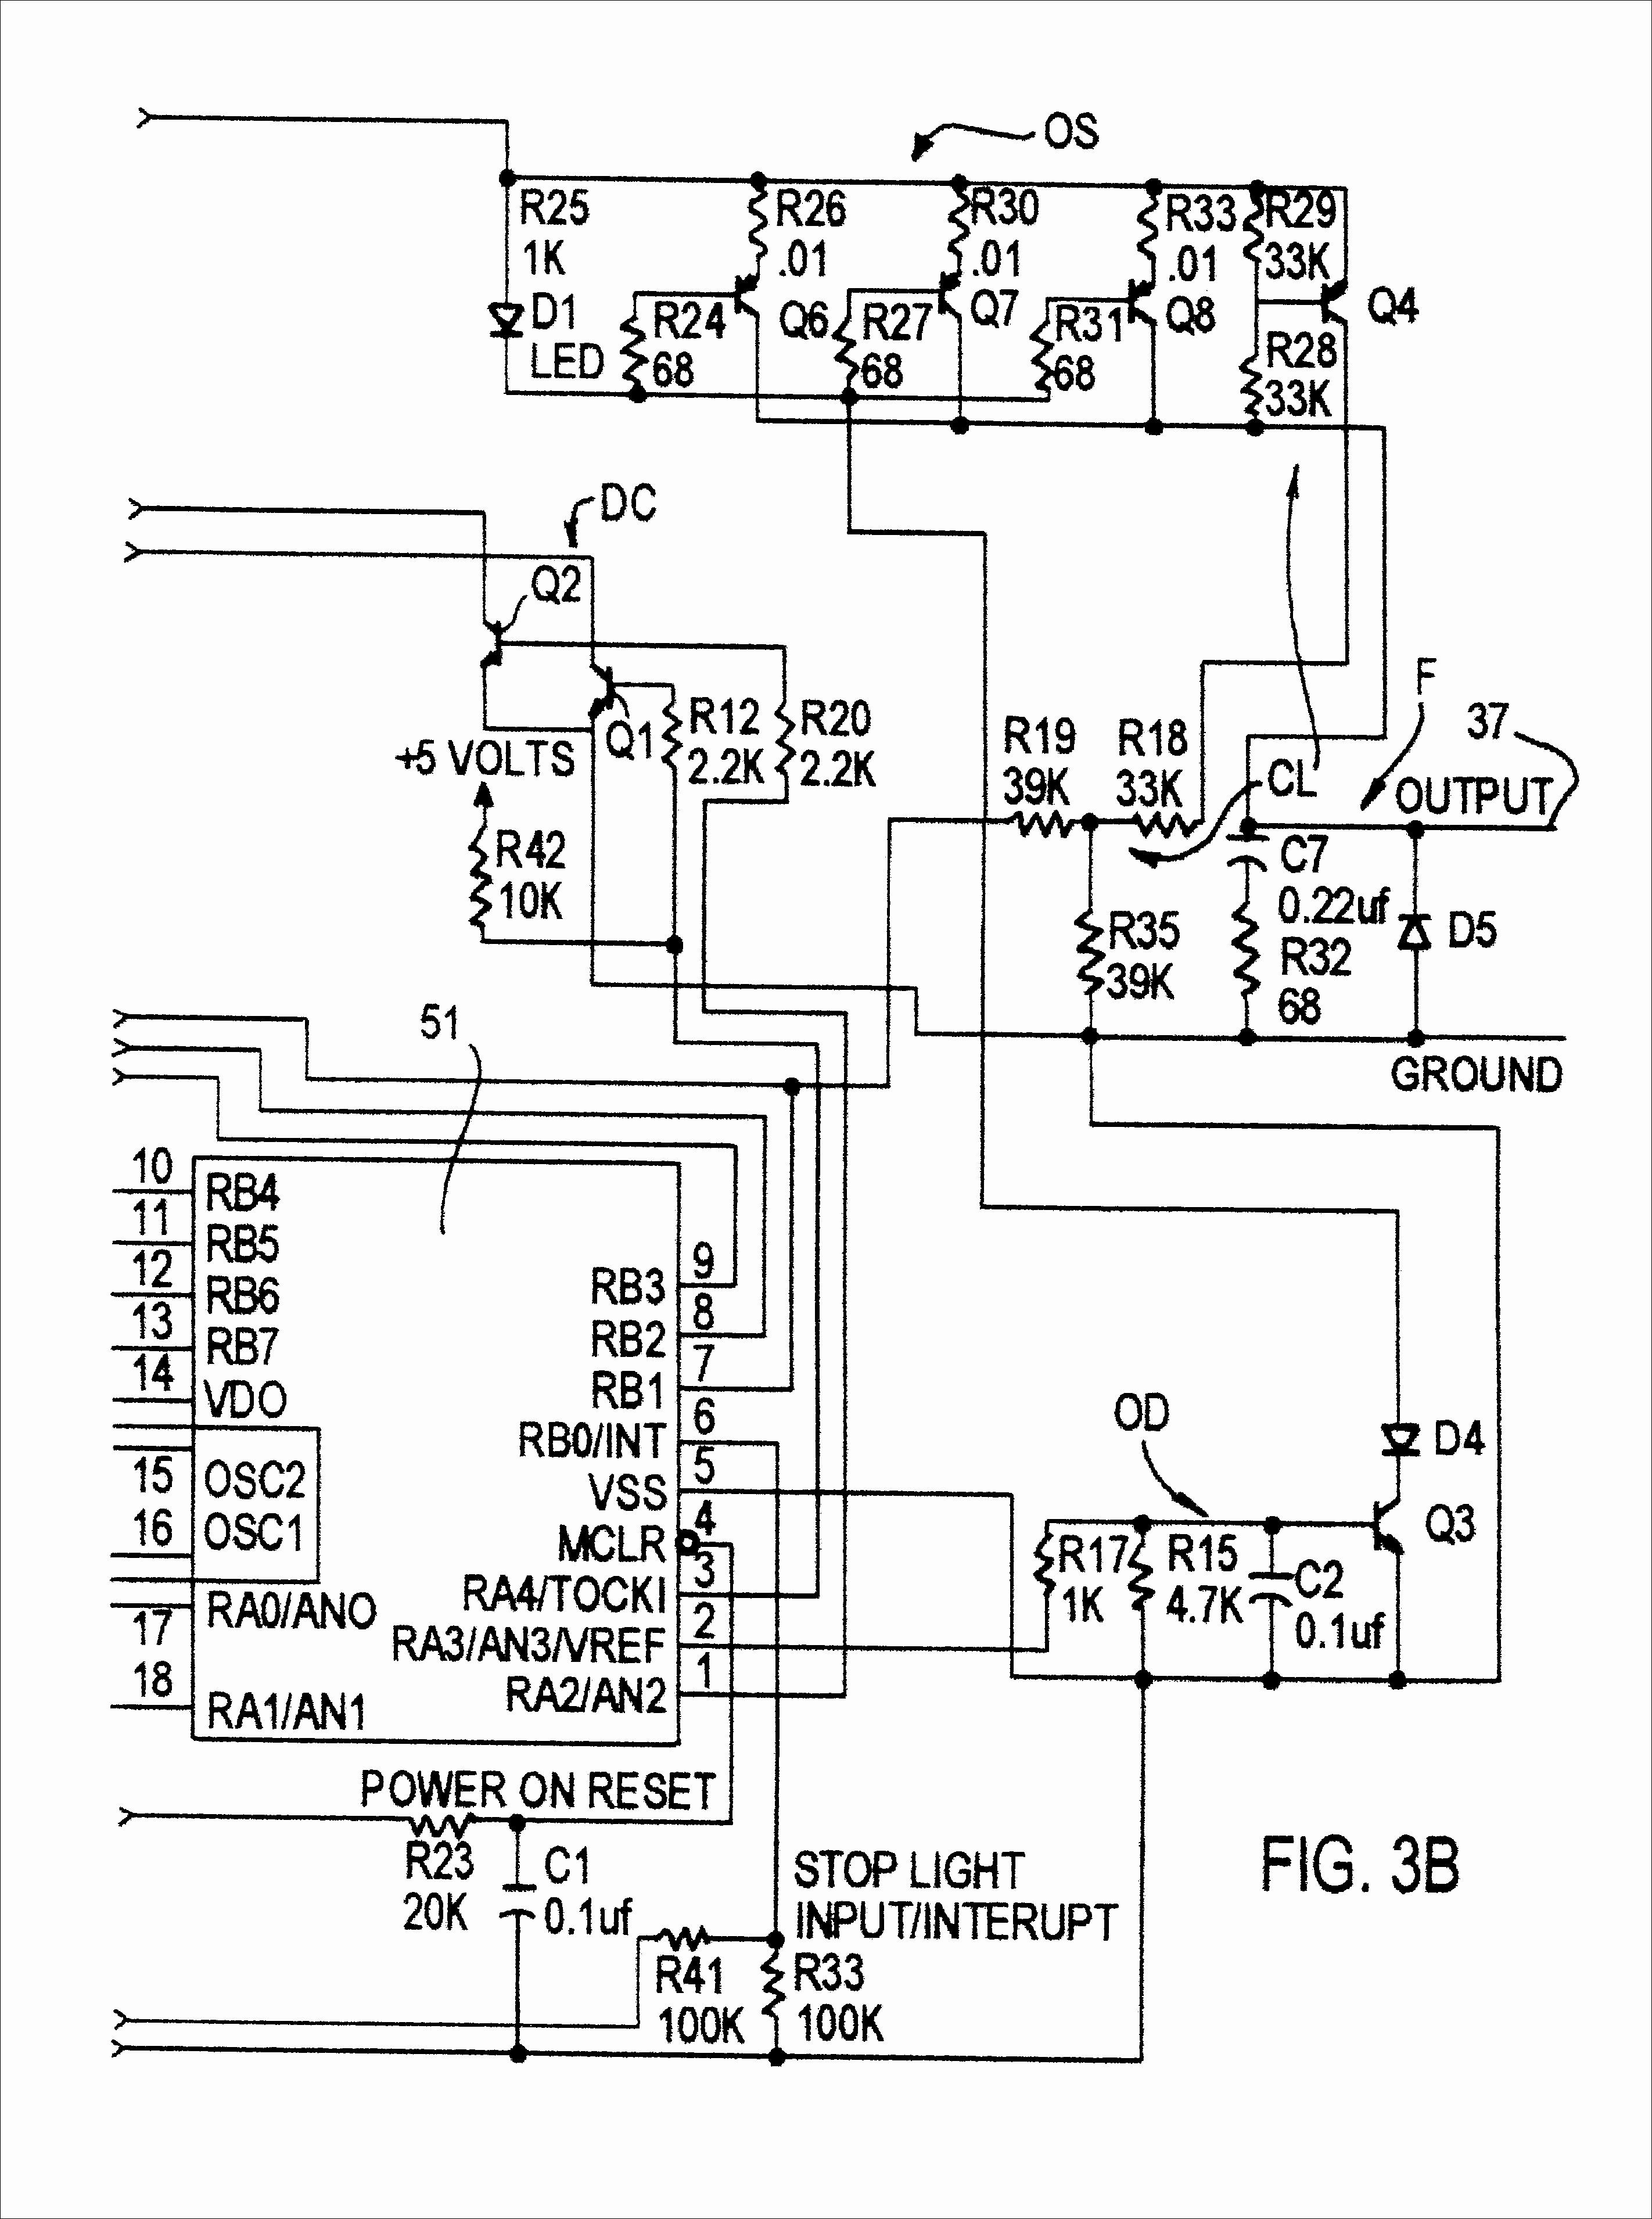 Diesel Engine Components Diagram Car Engine Schematics Smart Wiring Diagrams • Of Diesel Engine Components Diagram